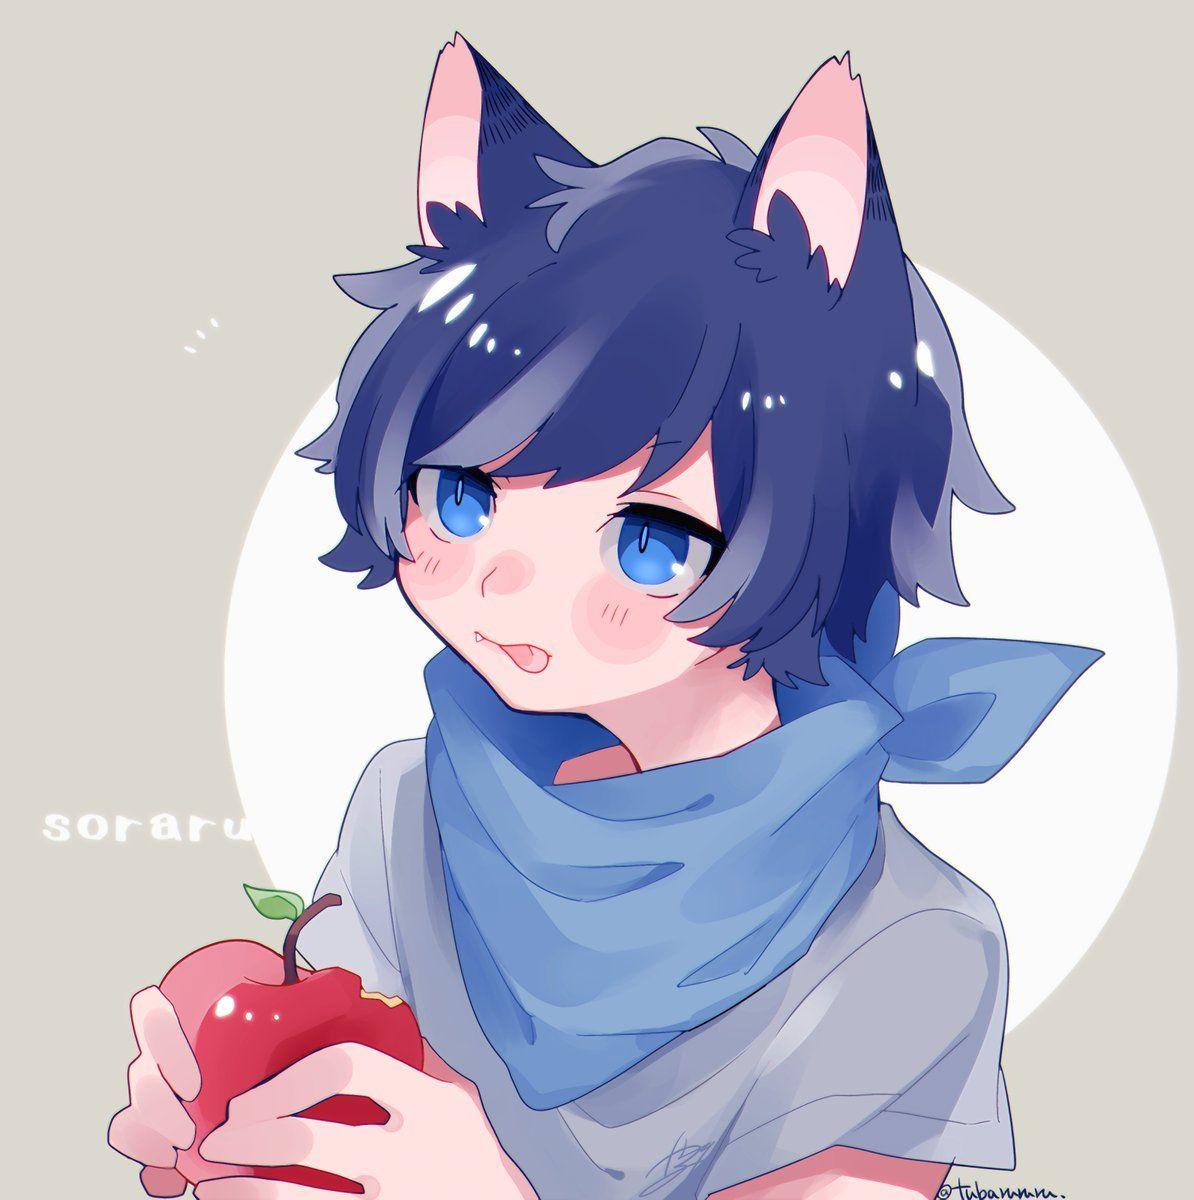 Pin by Kiho on tubarururu Pinterest Anime, Neko boy